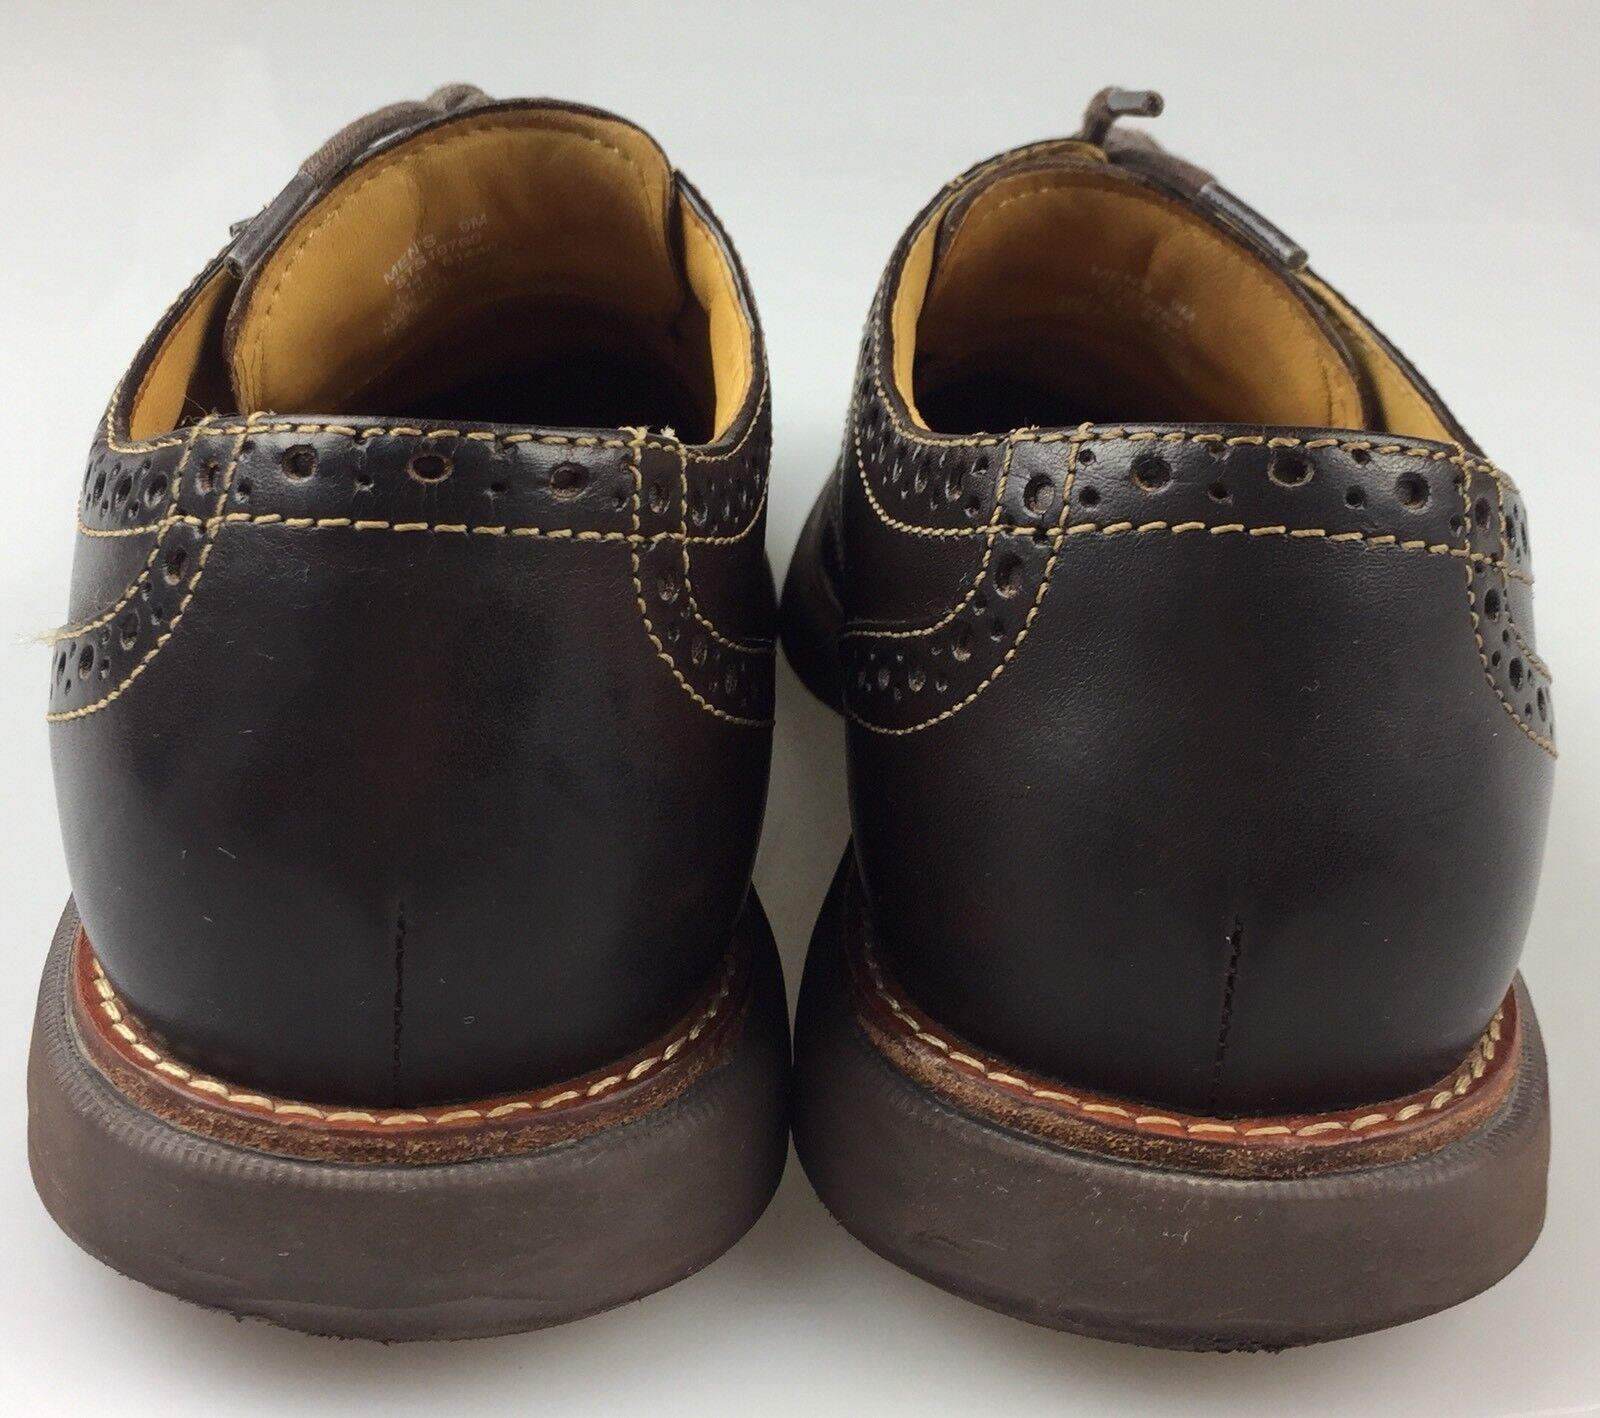 buy popular 79d88 599aa ... Mens 9M Sperry Sperry Sperry Gold Cup Bellingham Wingtip Oxford Brogue  Dark Brown Leather Shoe 70dda9 ...